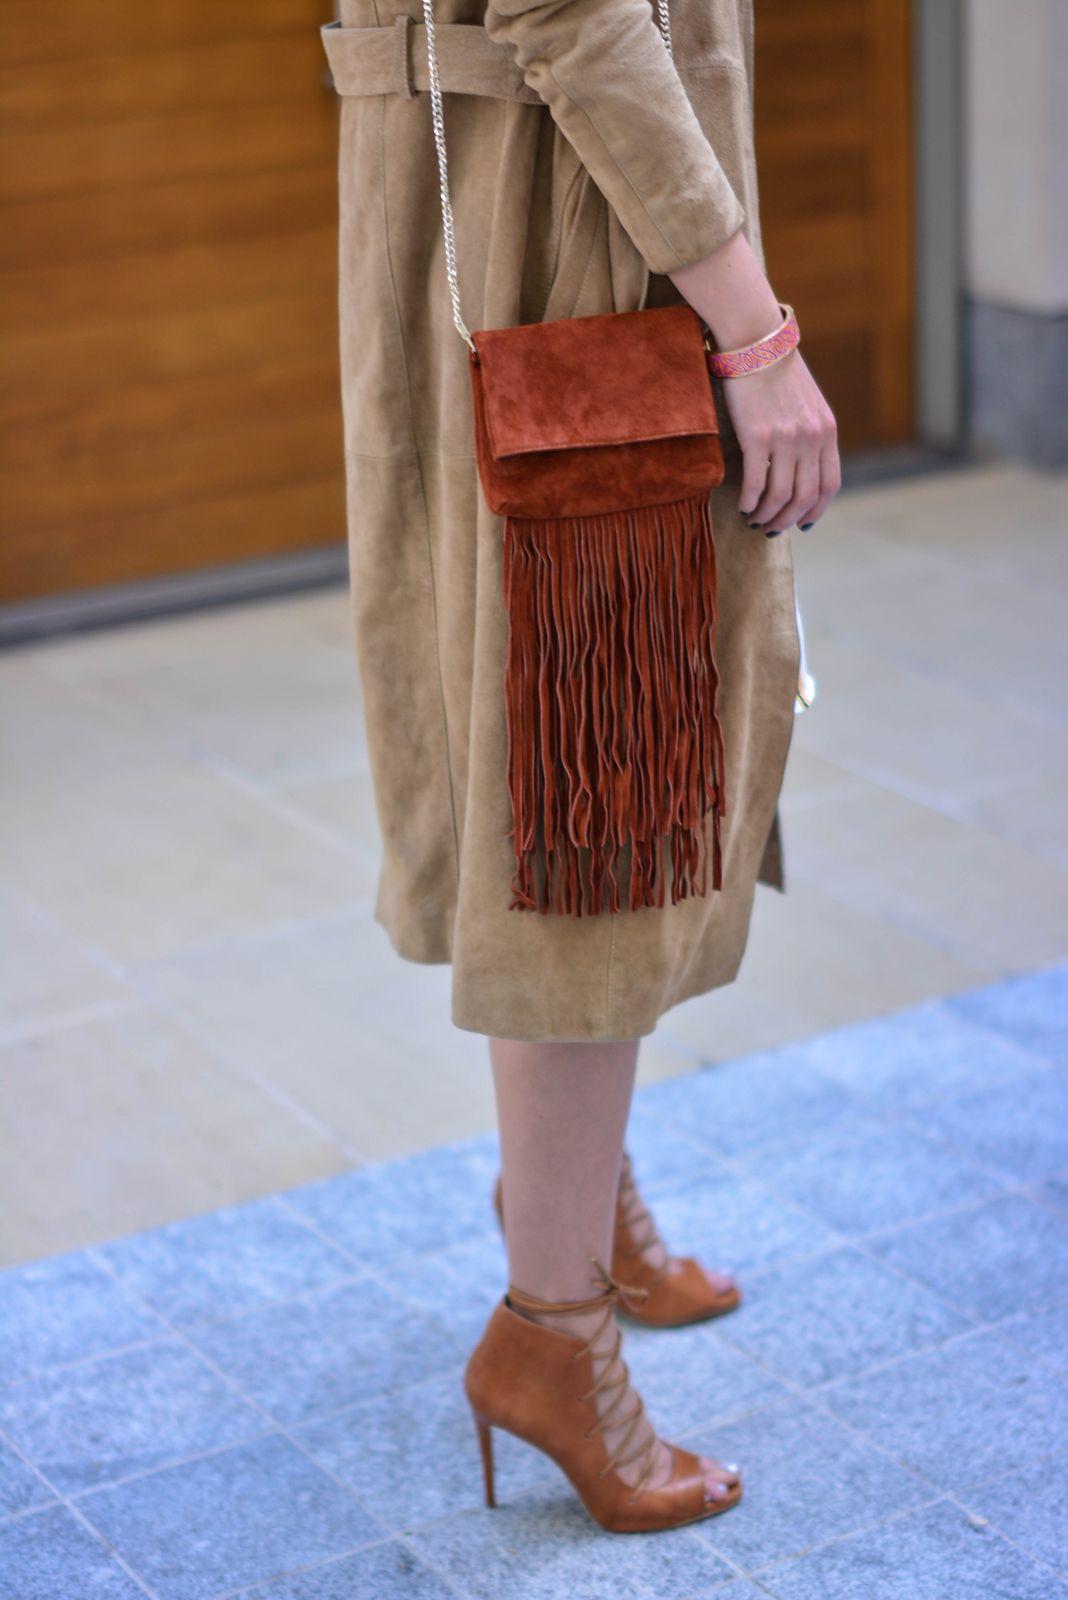 42e4c6dc00e EJSTYLE - Emma Hill wears Gestuz suede trench coat, tan lace up heels,  Karen Millen suded fringe bag, OOTD